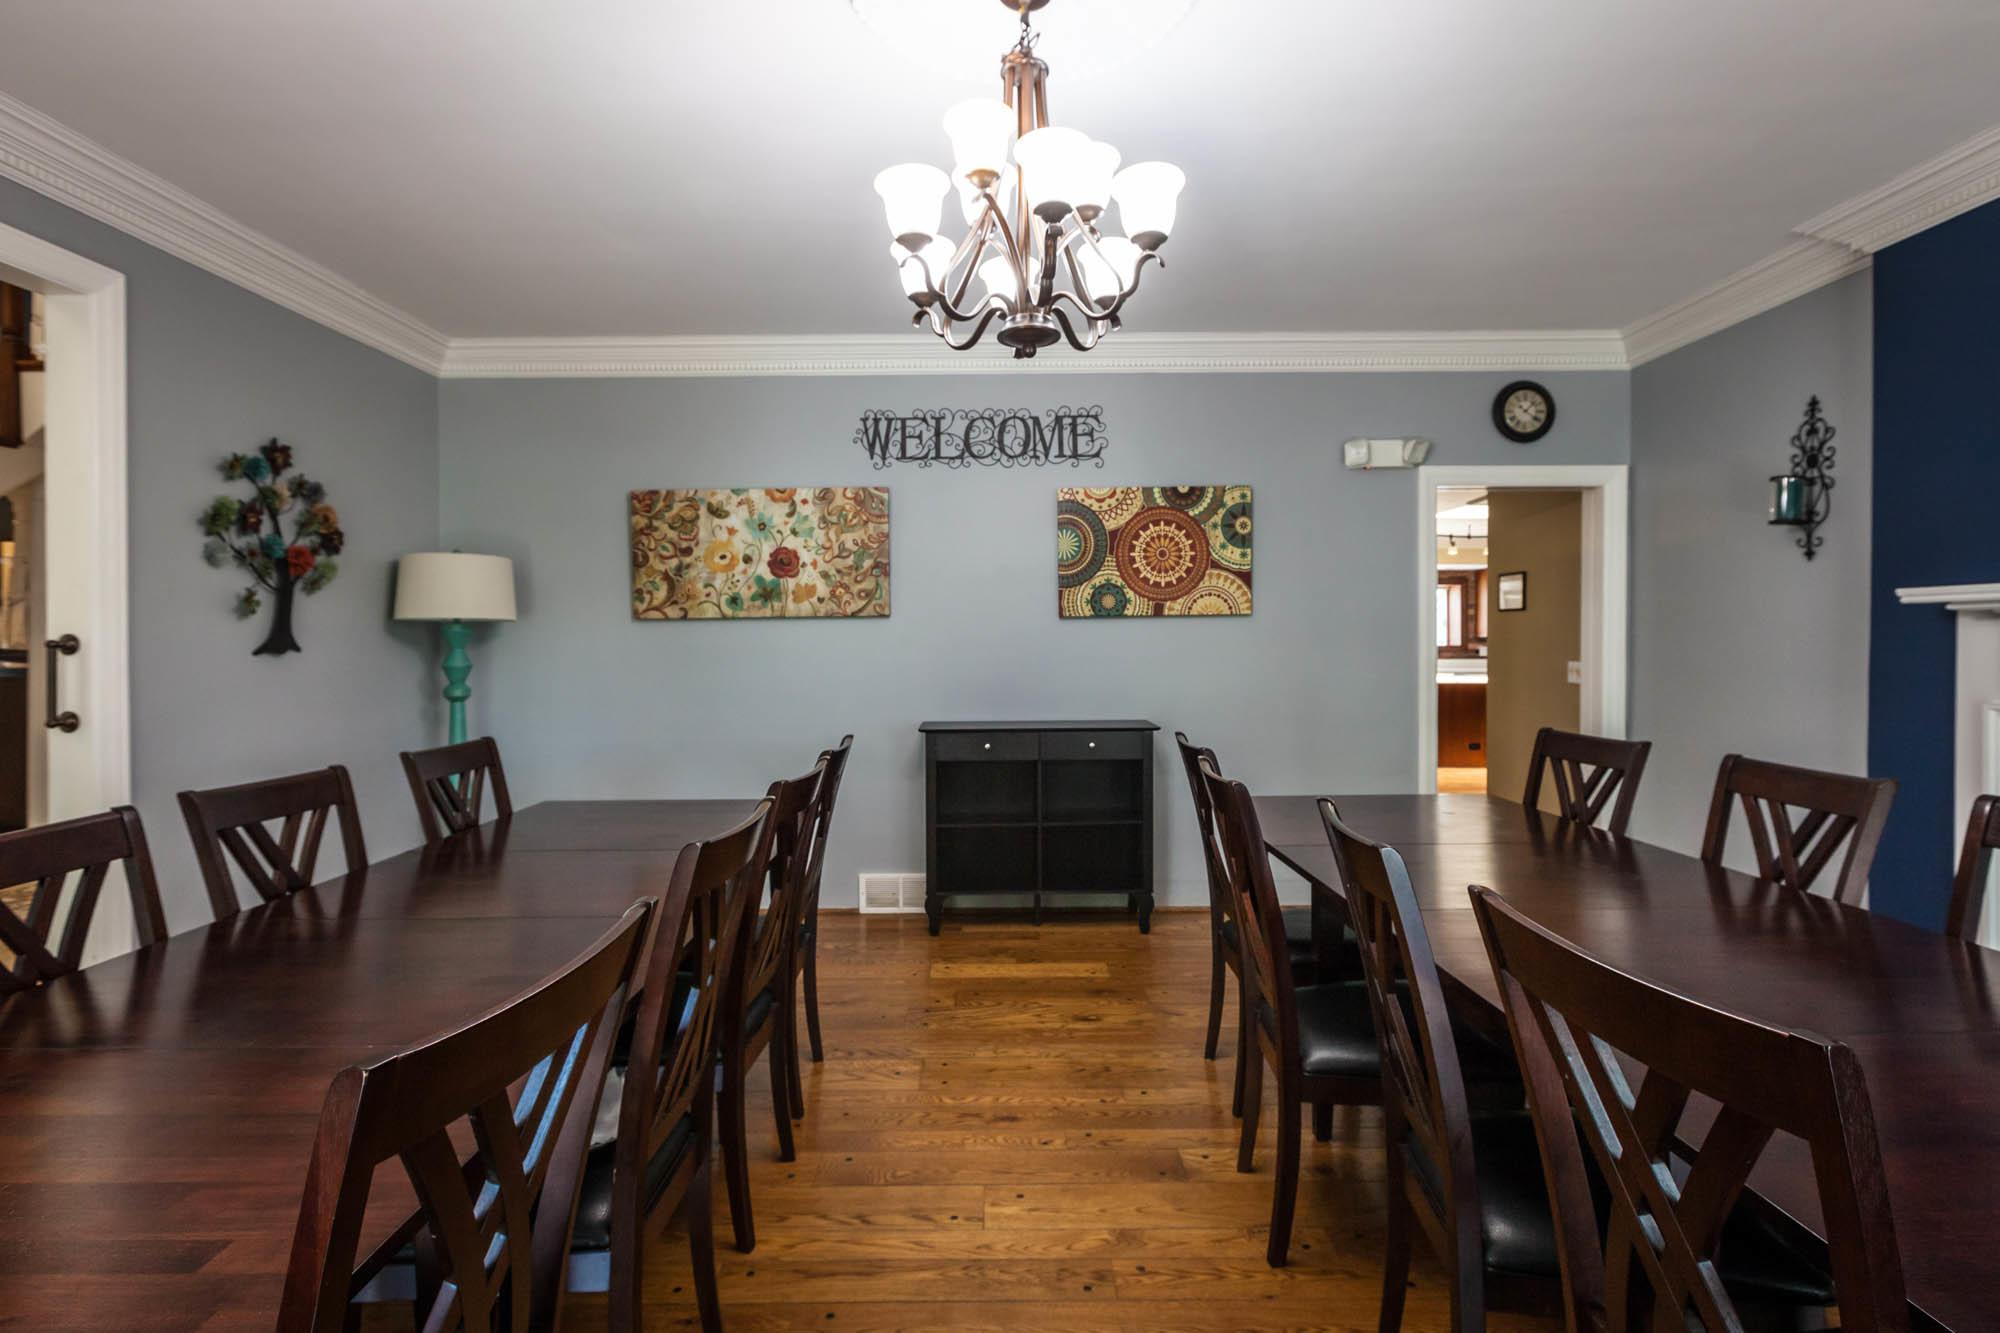 The Ridge Ohio Residential Alcohol and Drug Treatment image 4